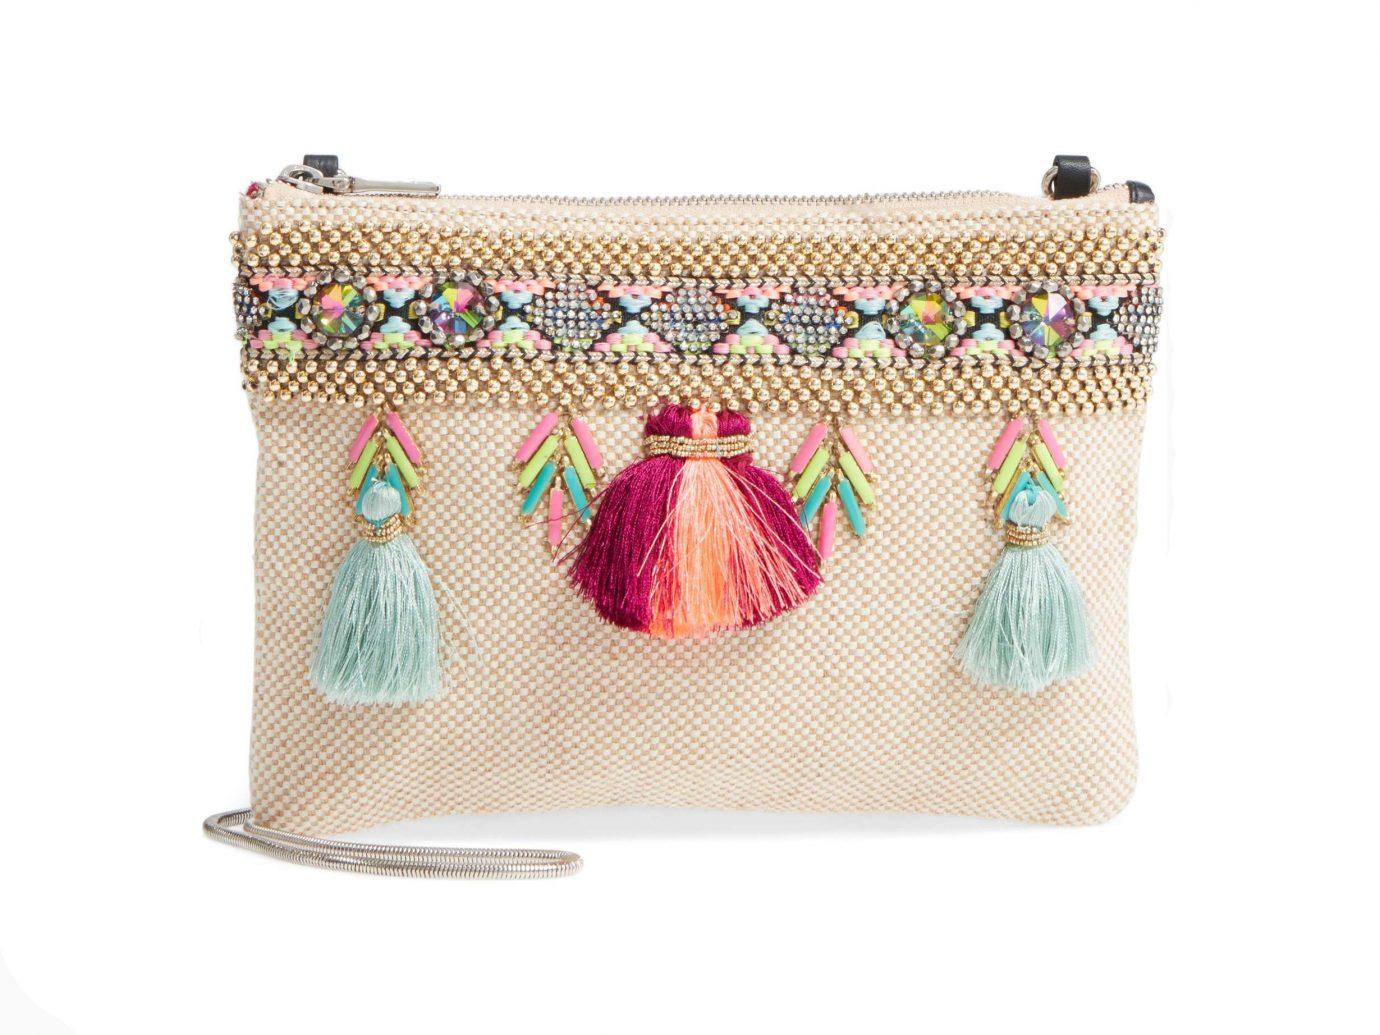 Trip Ideas bag handbag pink fashion accessory coin purse shoulder bag product beige wristlet pattern